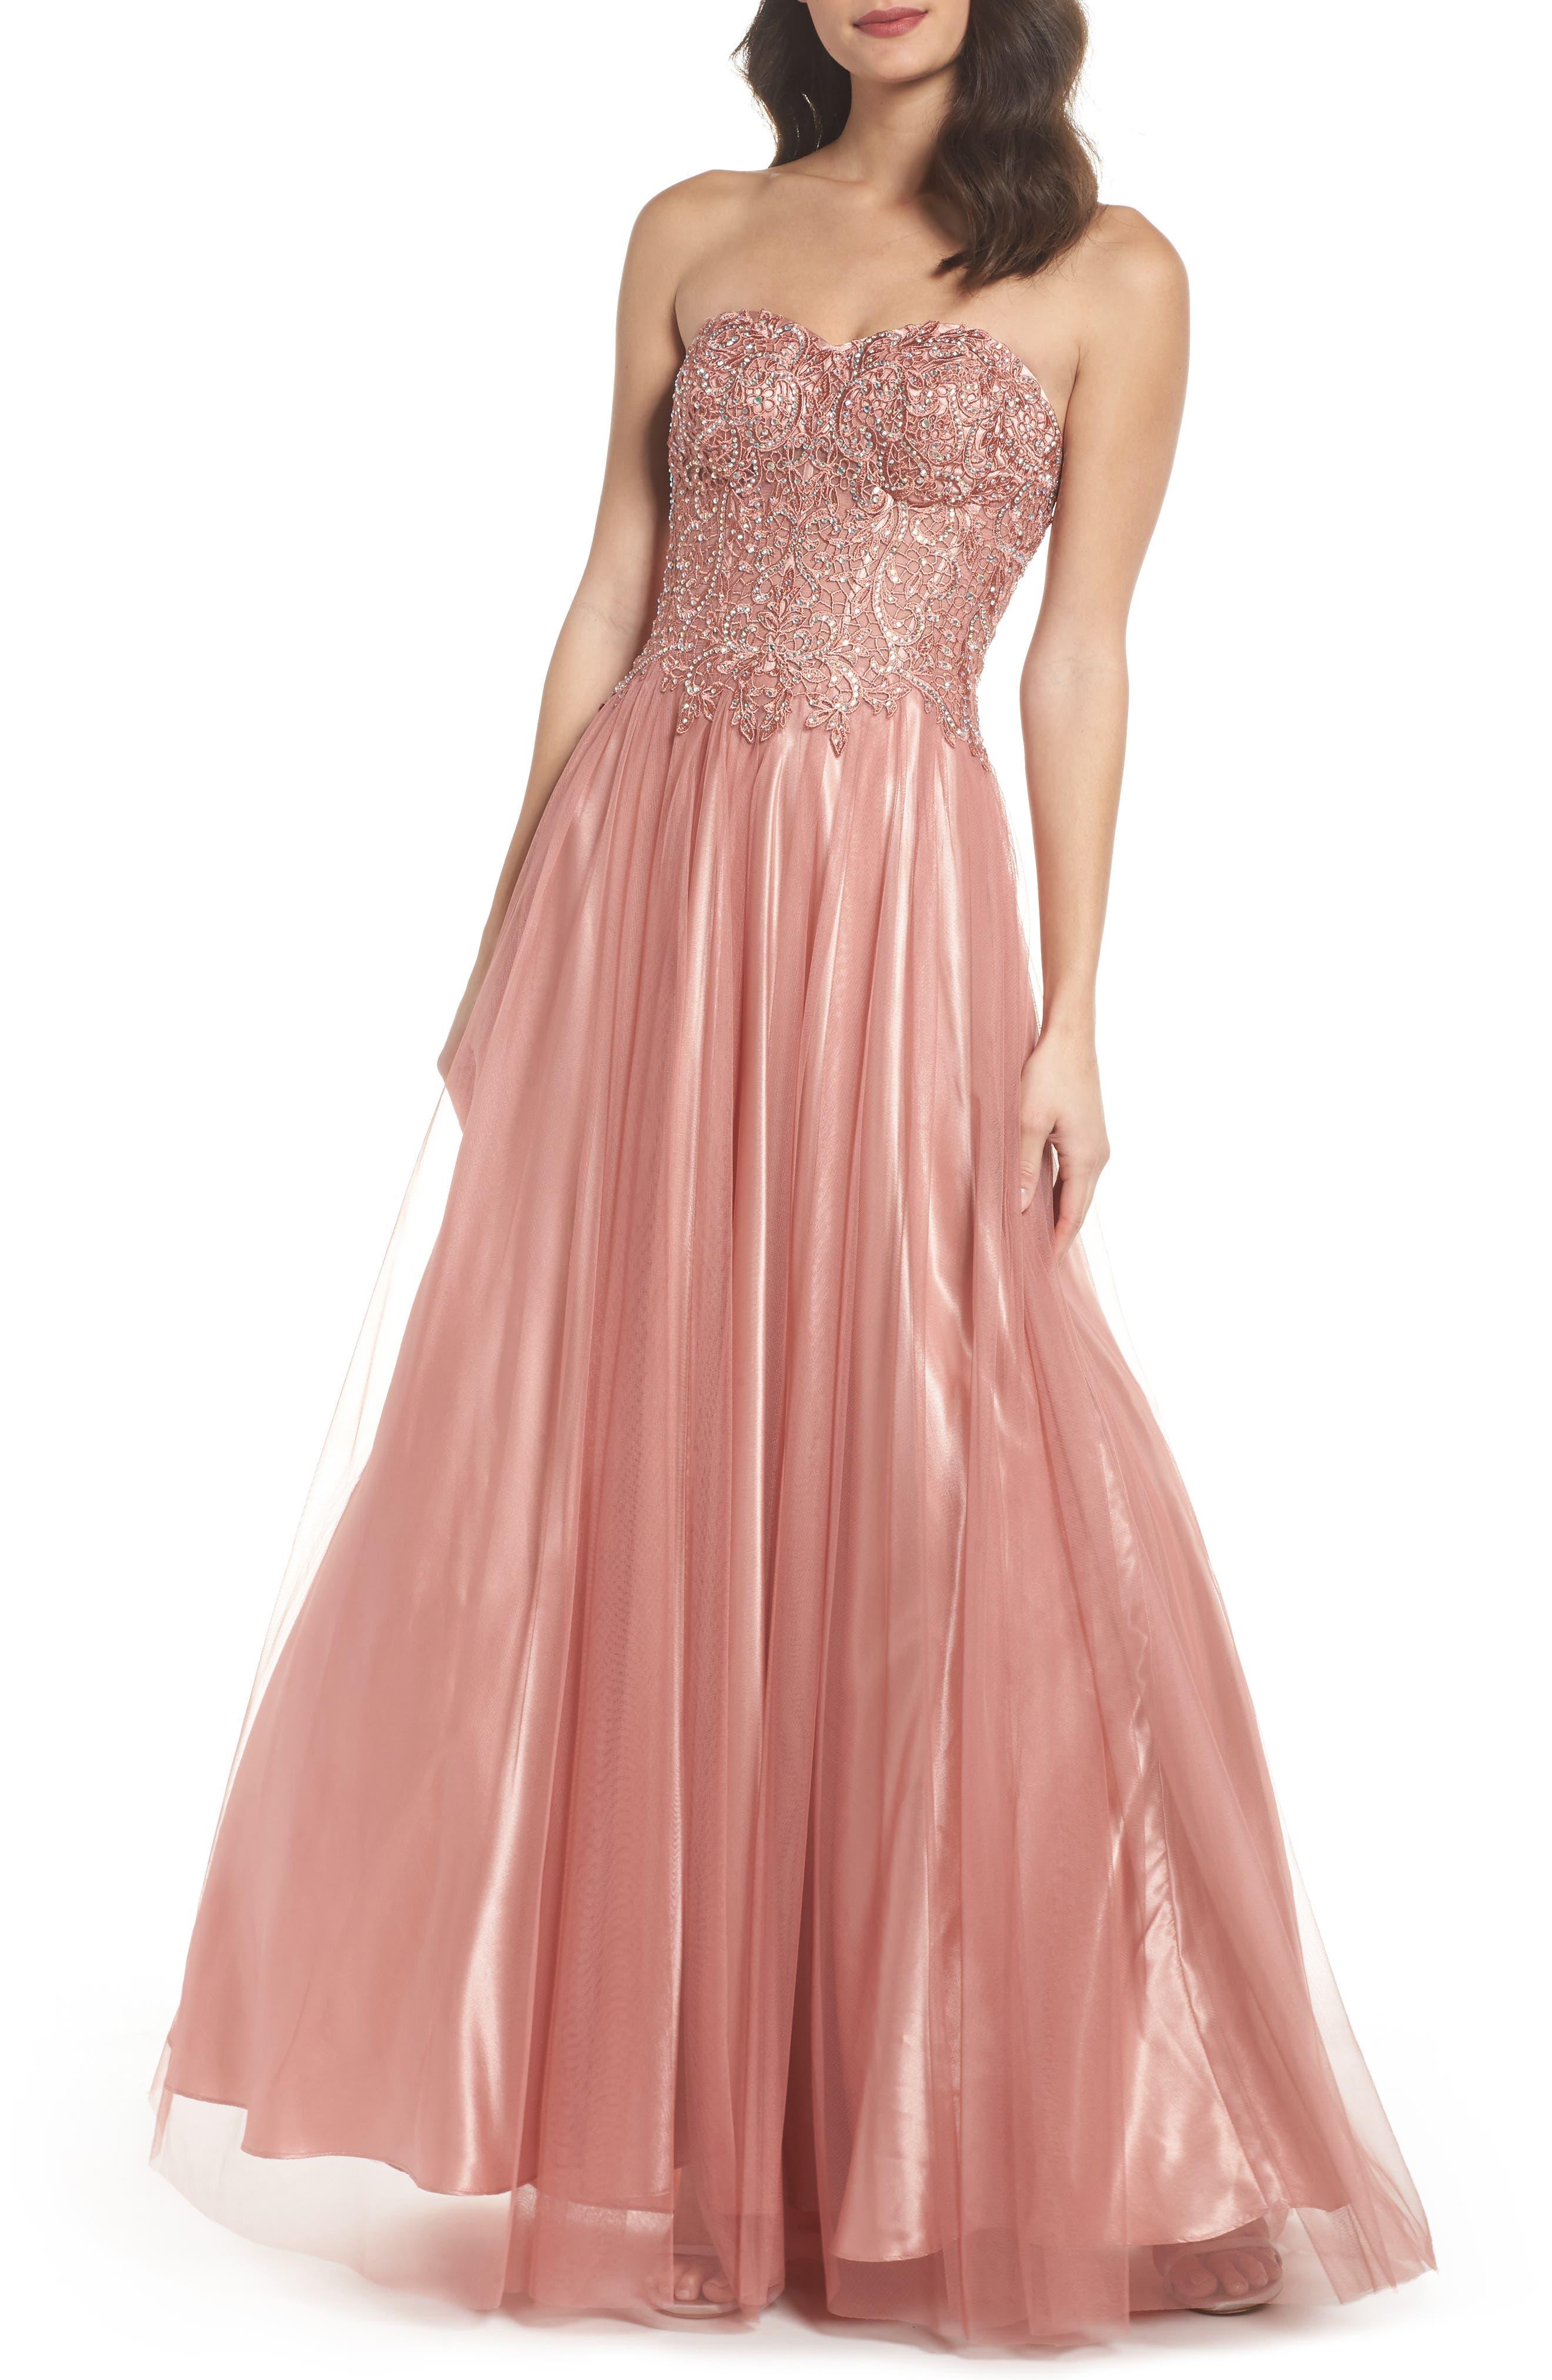 Embellished Corset Ballgown,                             Main thumbnail 1, color,                             Rose